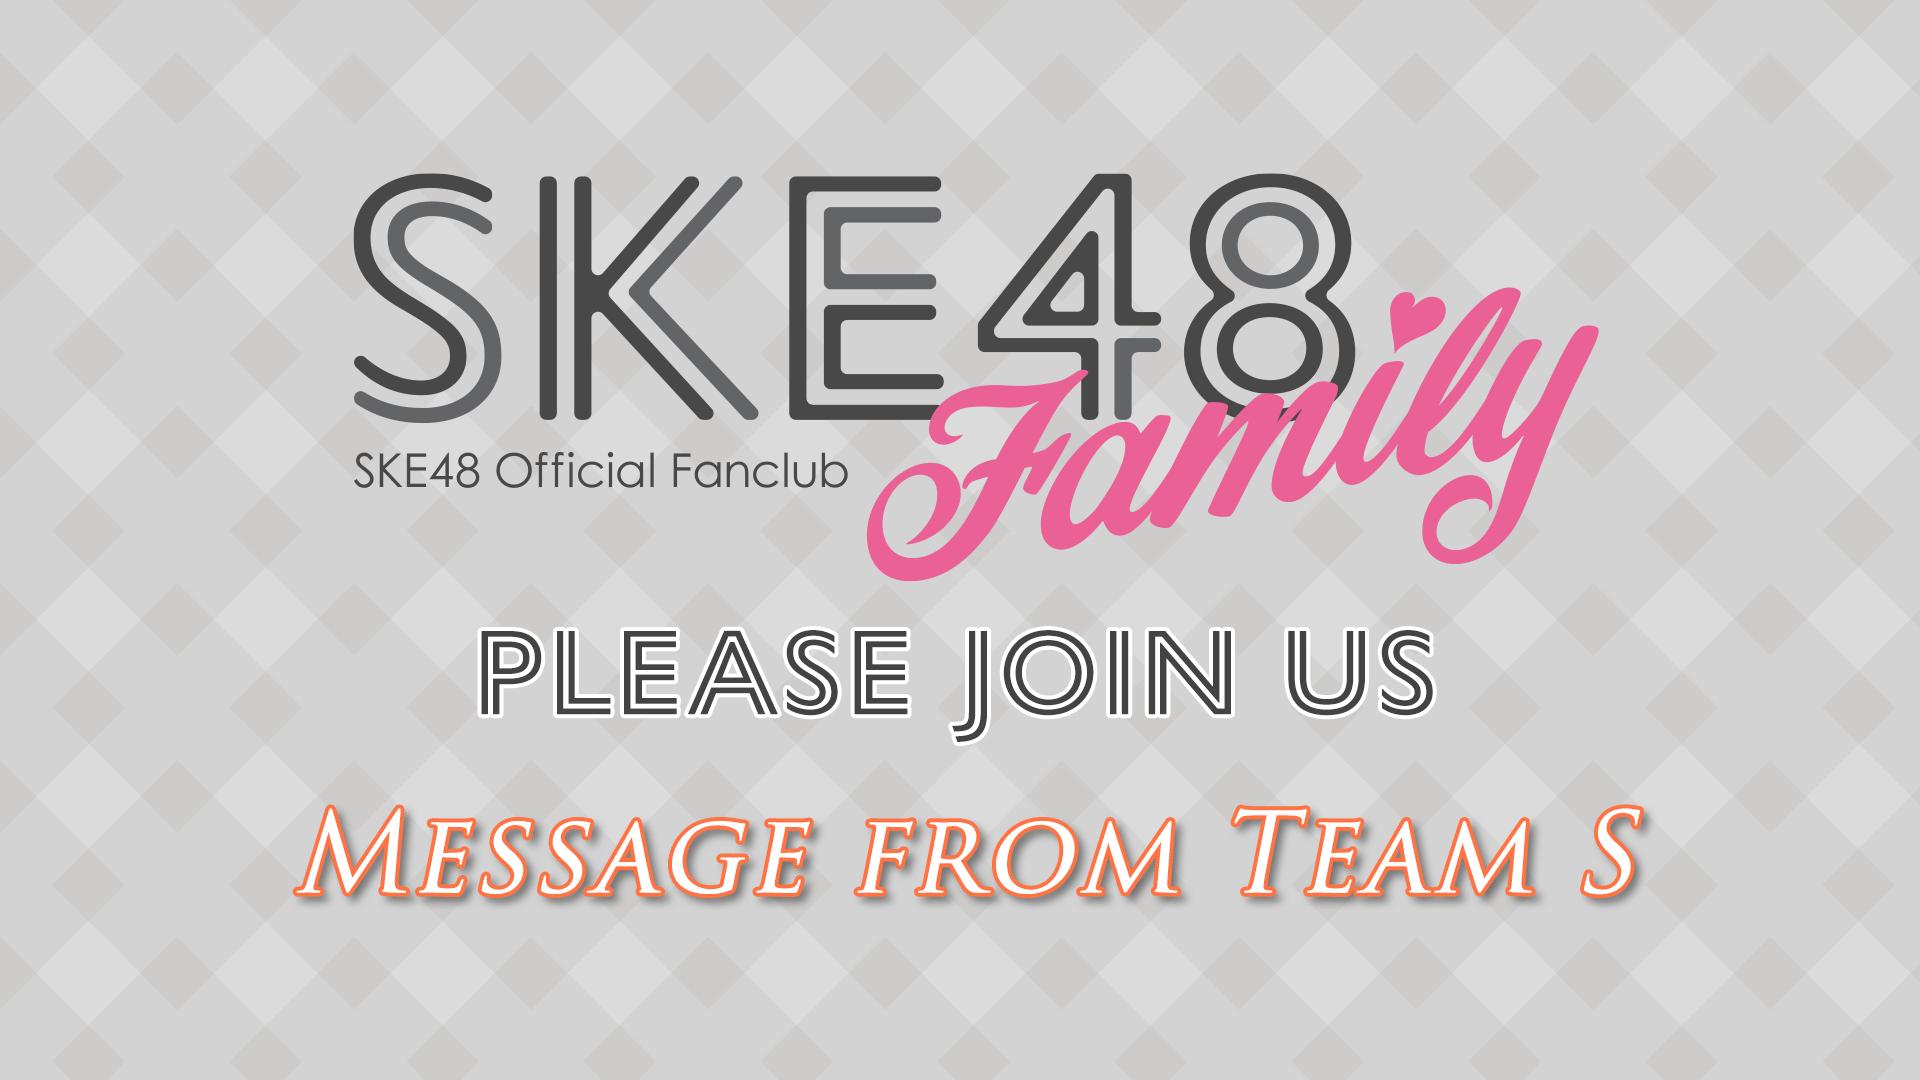 SKE48 Family入会受付中!チームSメンバーからのメッセージをどうぞ!